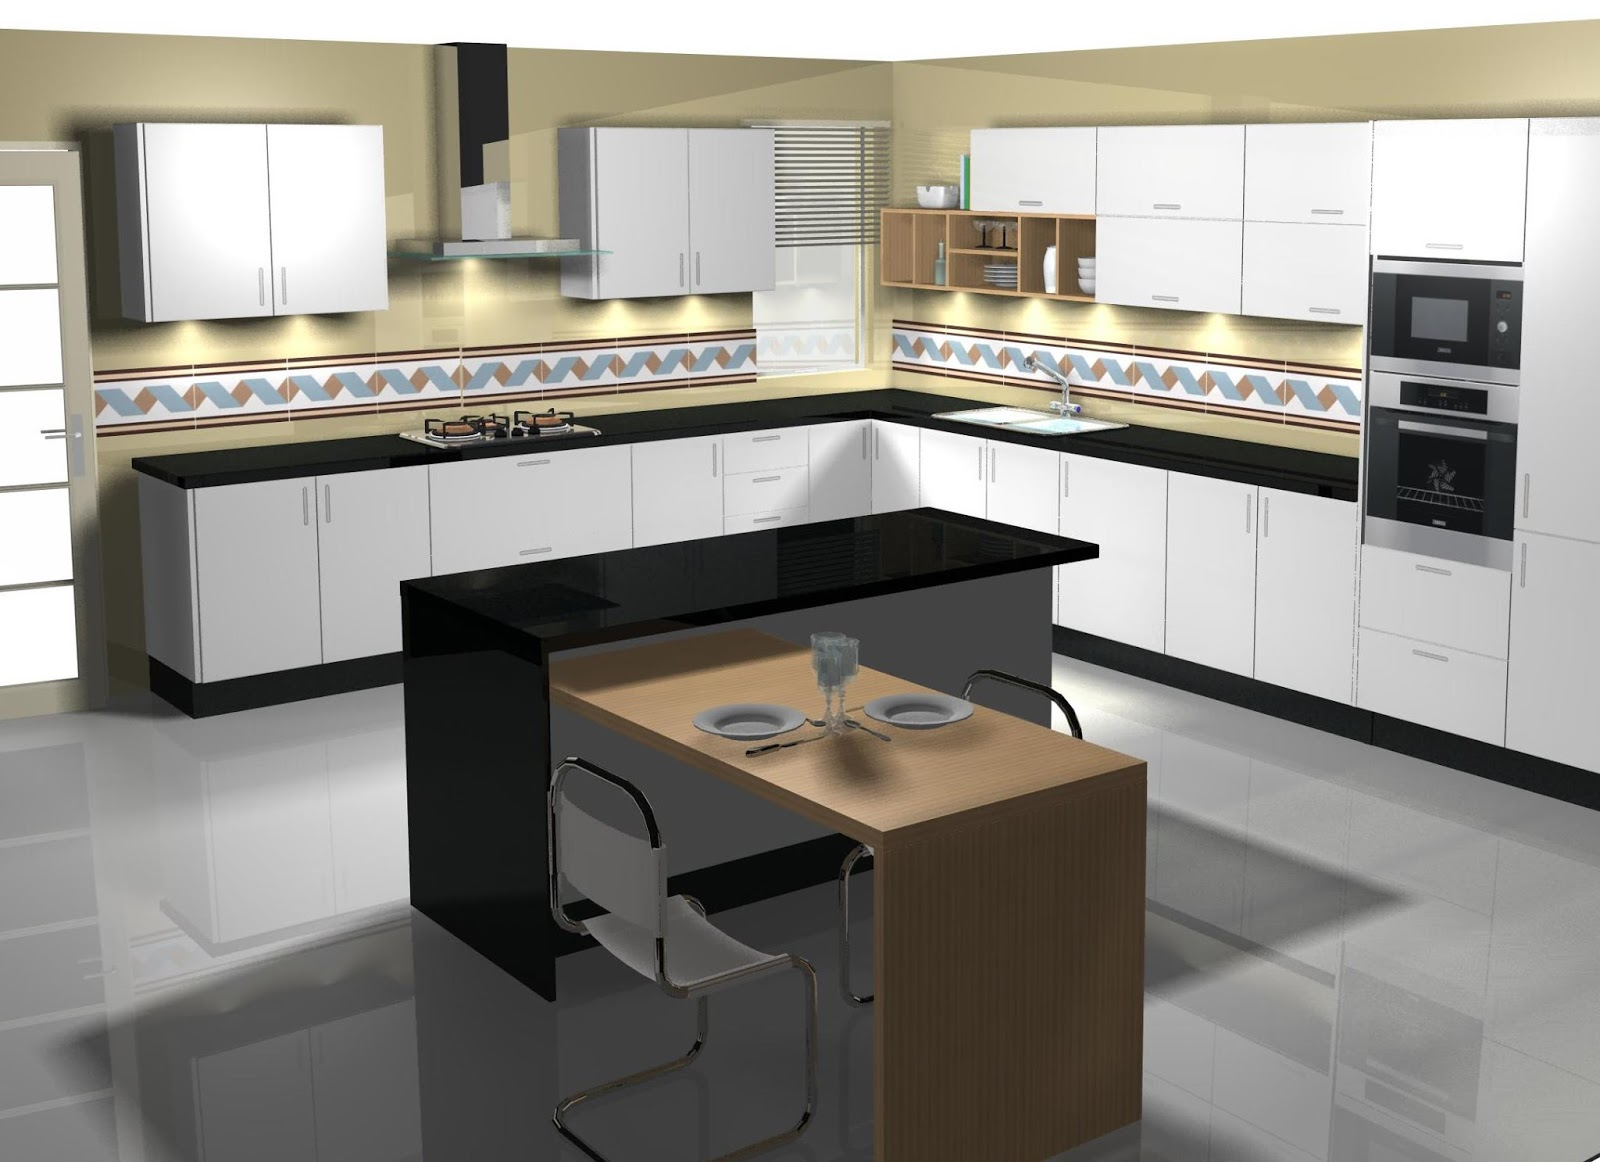 Dise o de cocina con isla y mesa - Isla de cocina con mesa ...